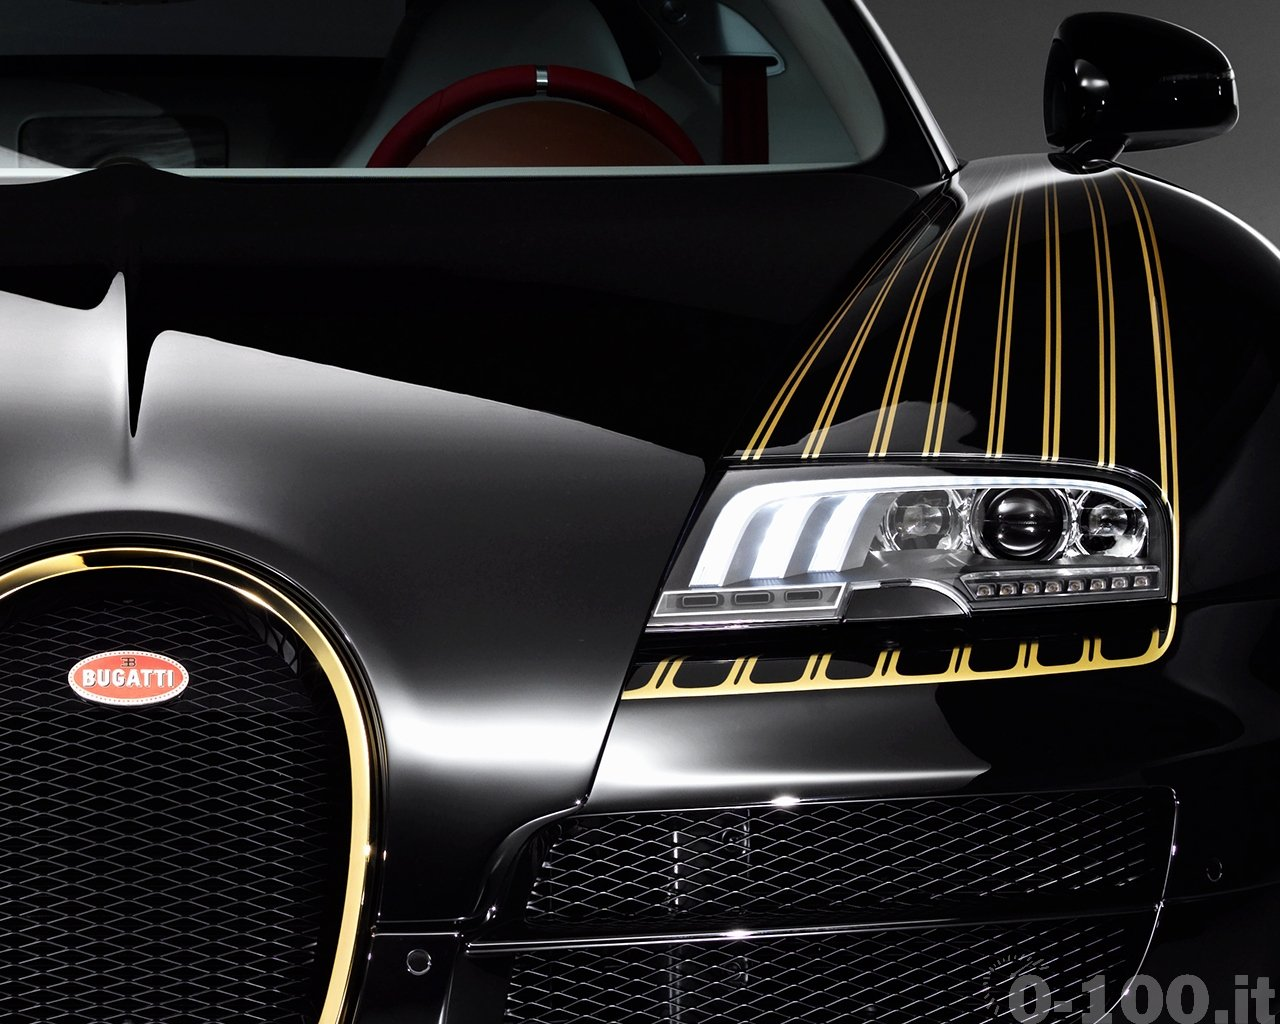 beijing-2014-bugatti-veyron-serie-speciale-les-legendes-de-bugatti-veyron-16-4-grand-sport-vitesse-black-bess_17